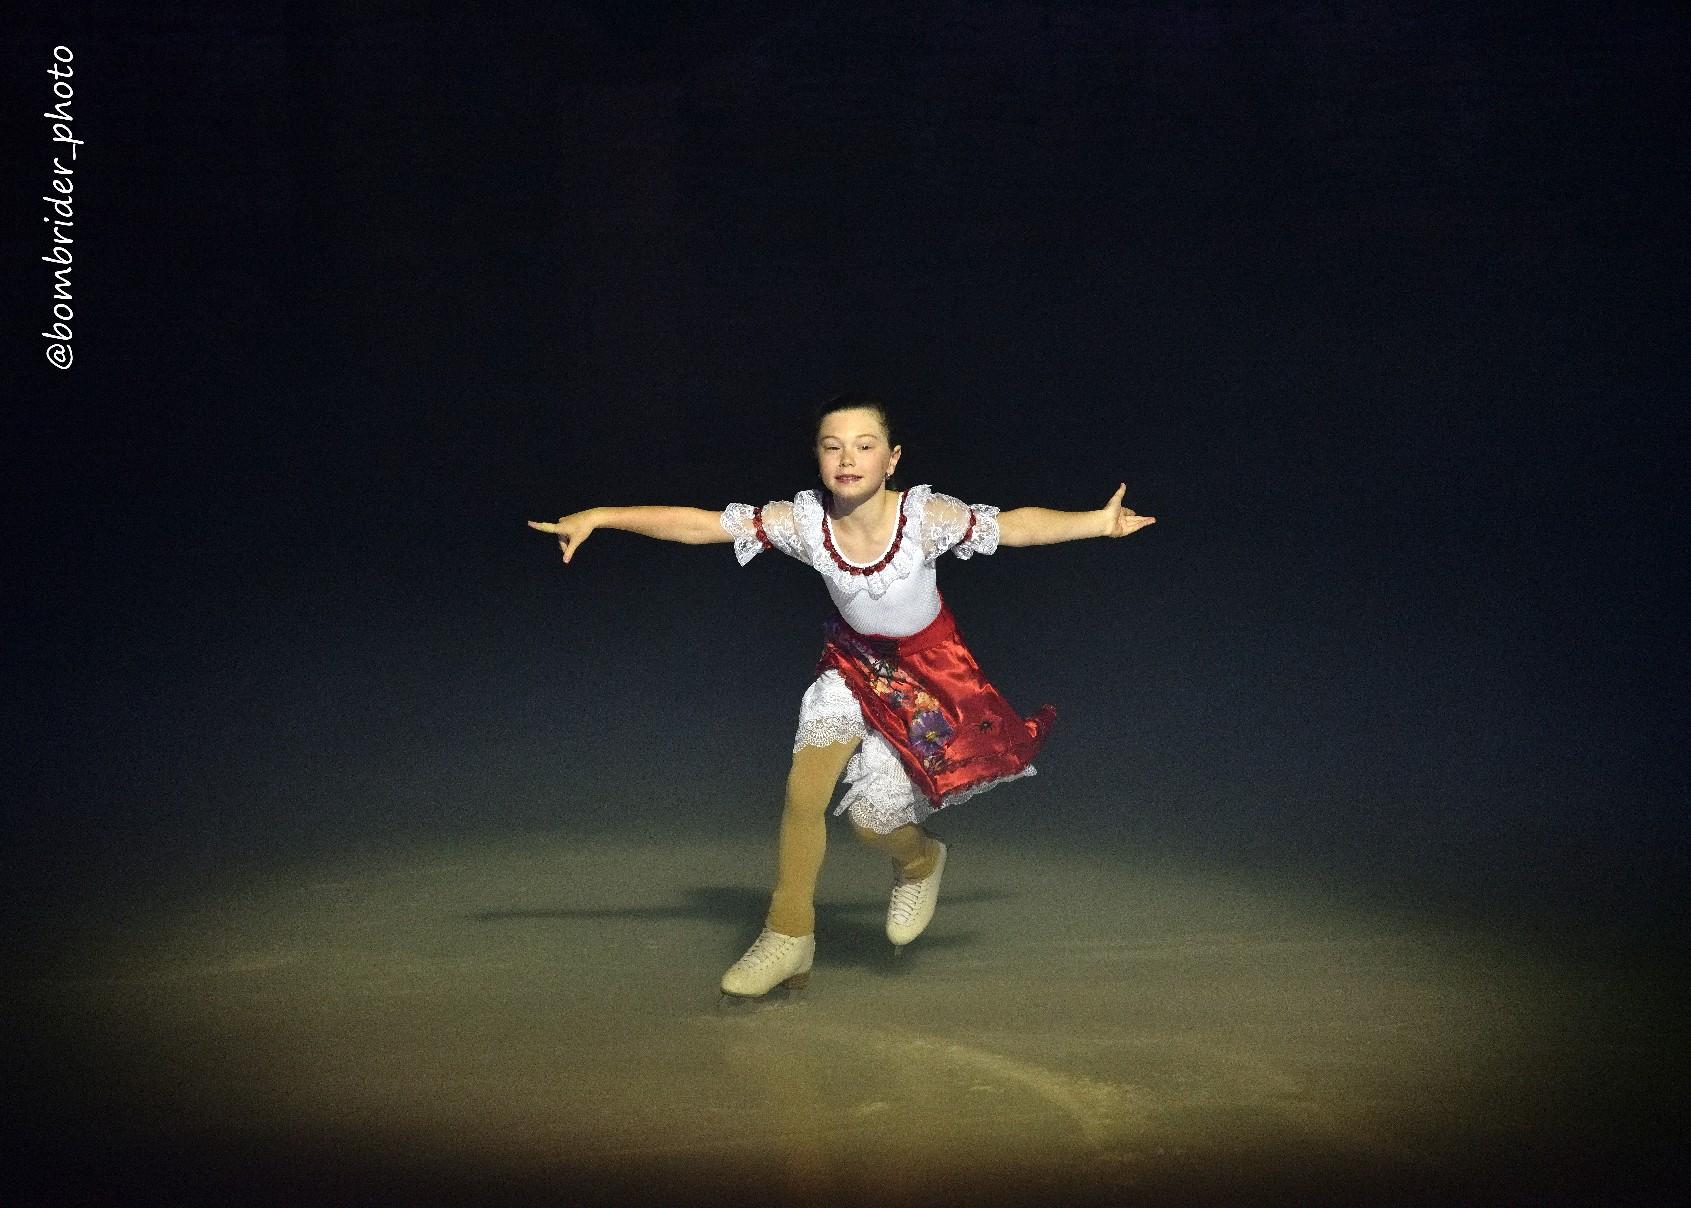 Мария Петрова-Алексей Тихонов - Страница 7 3AEIeNasHpE